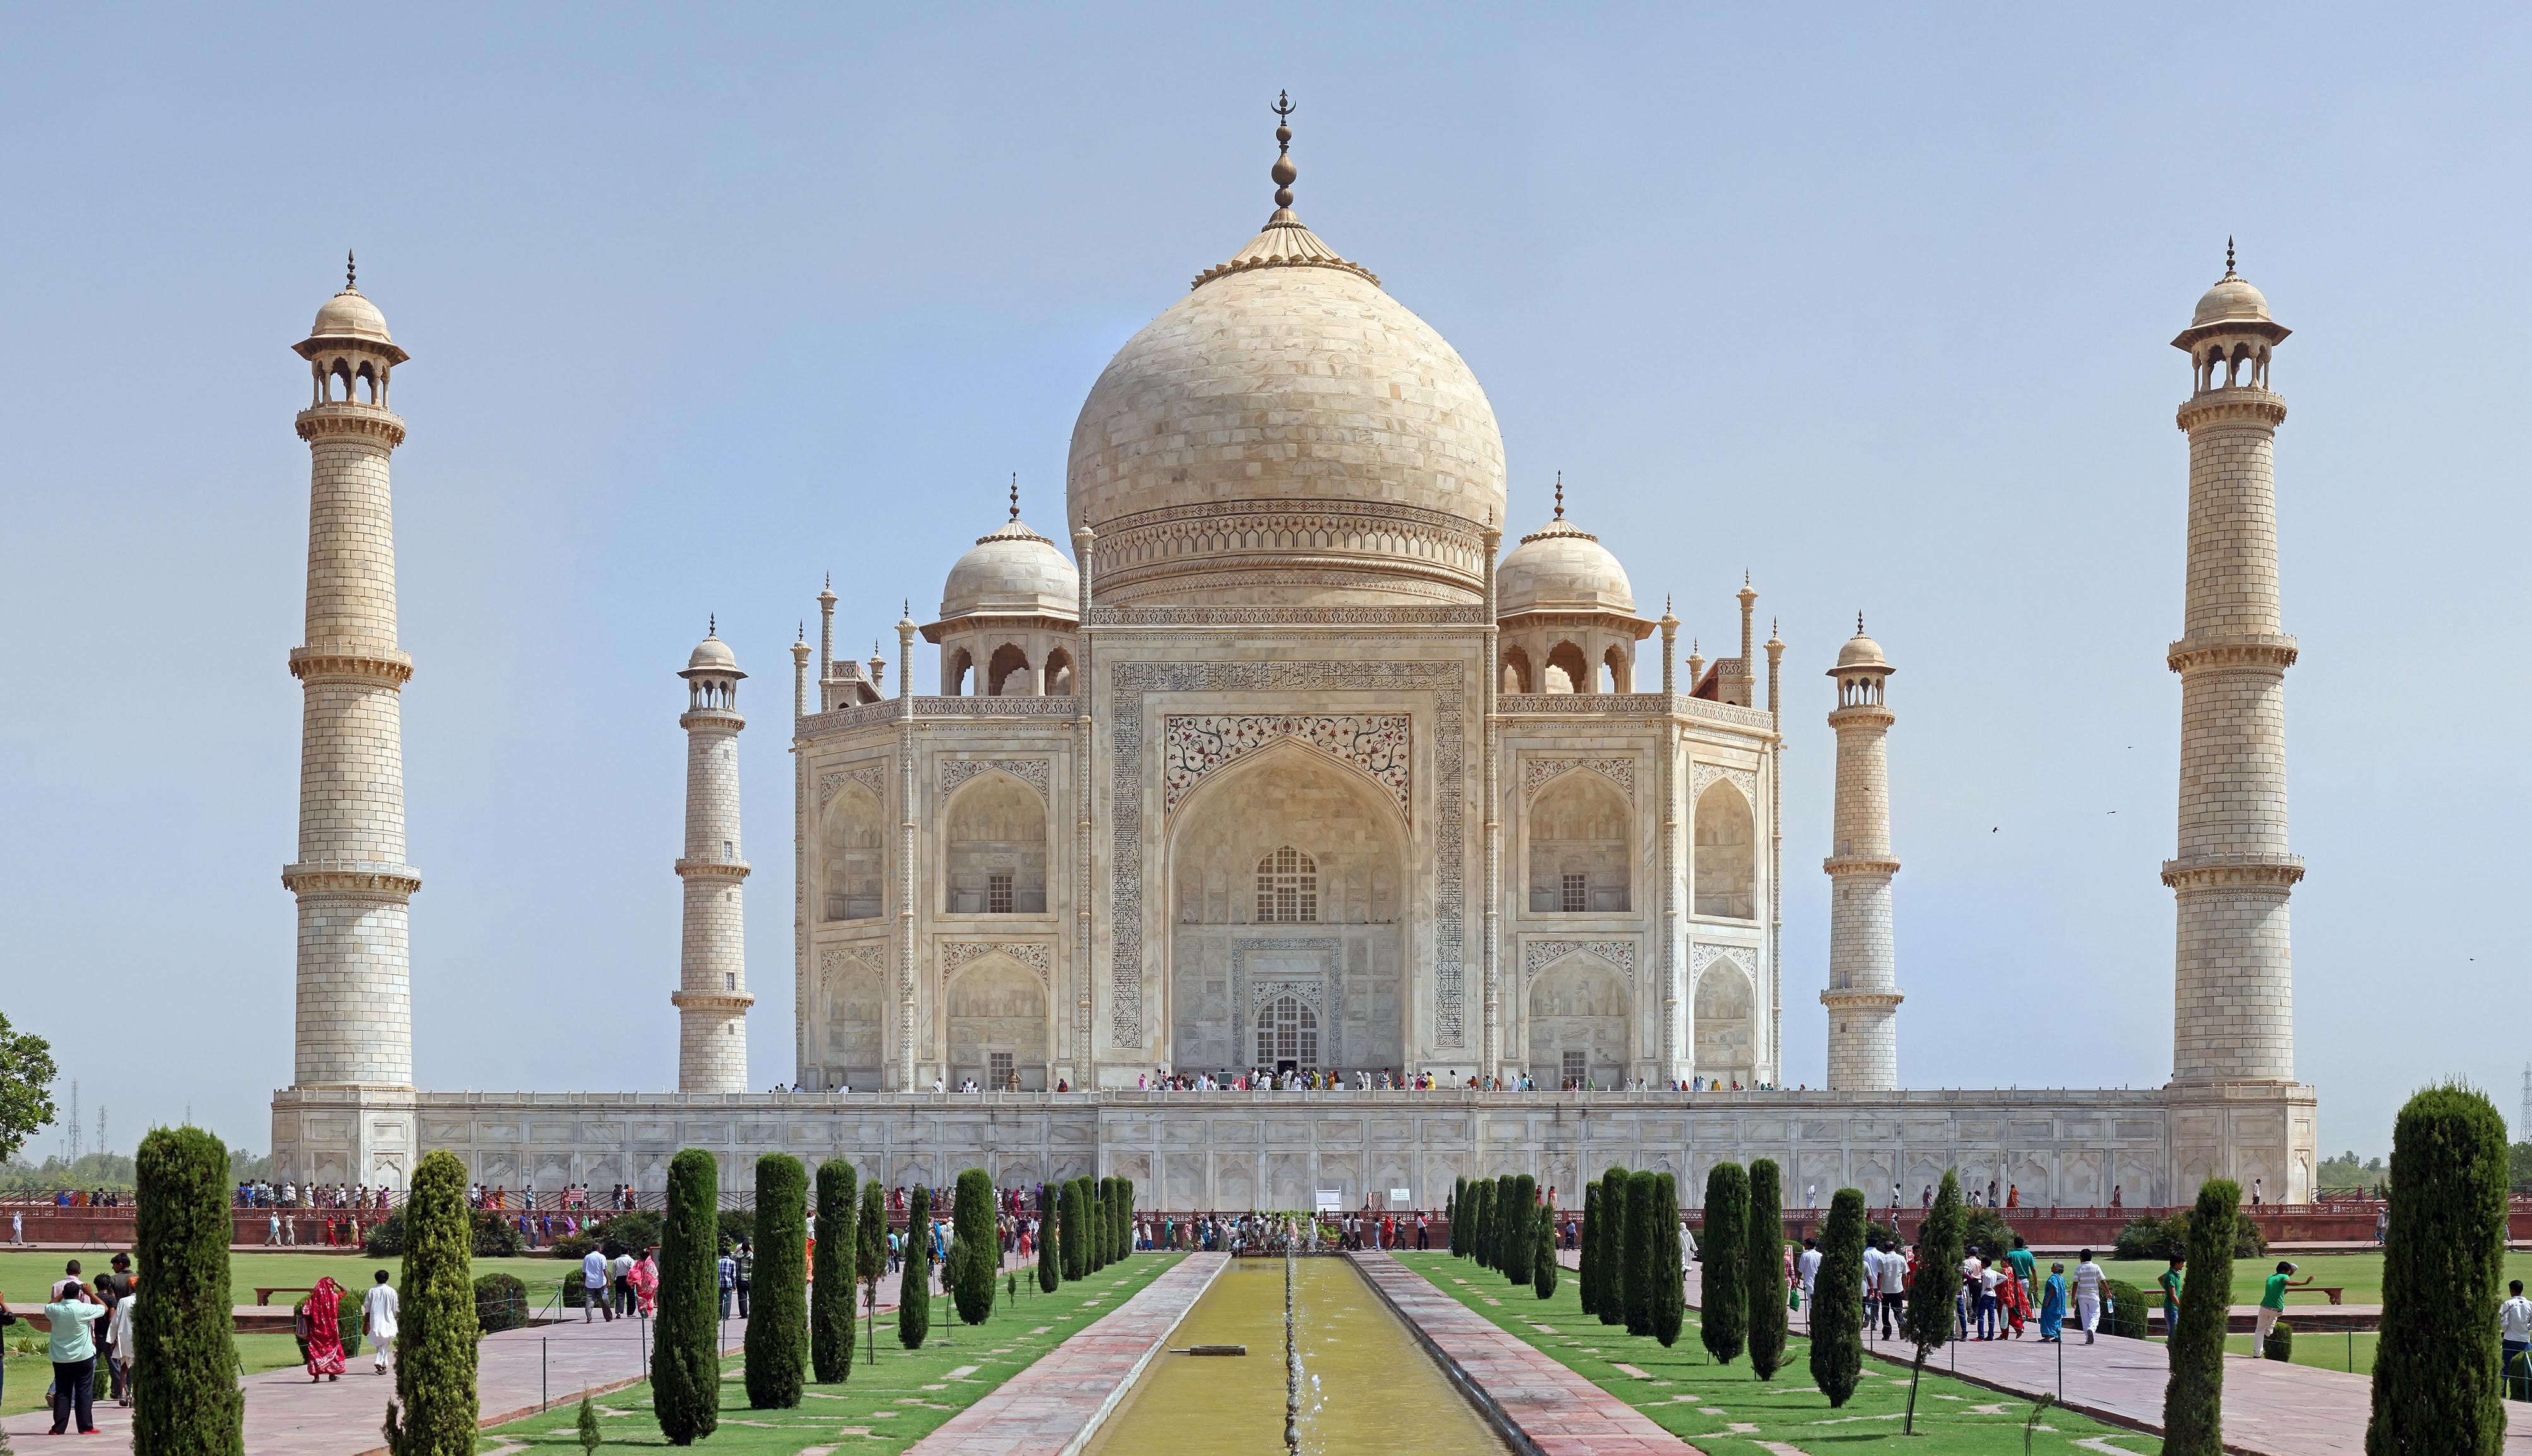 The Taj Mahal in Agra, India built by Shah Jahan.